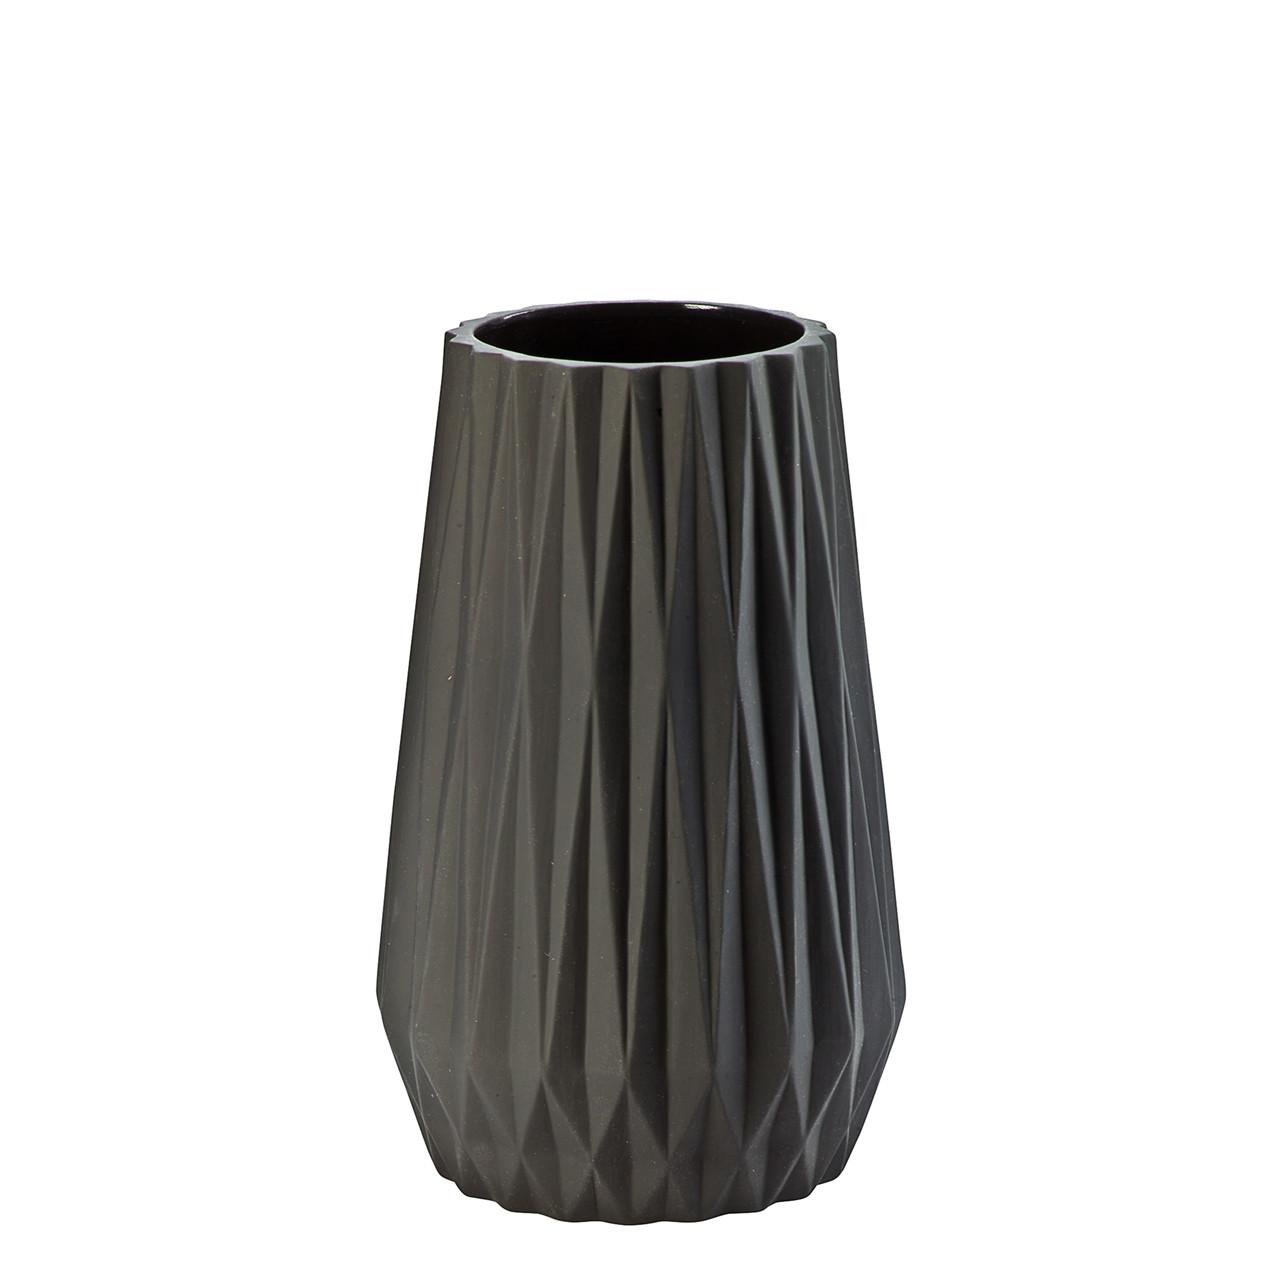 Cr ton maison leona vase for Creton maison